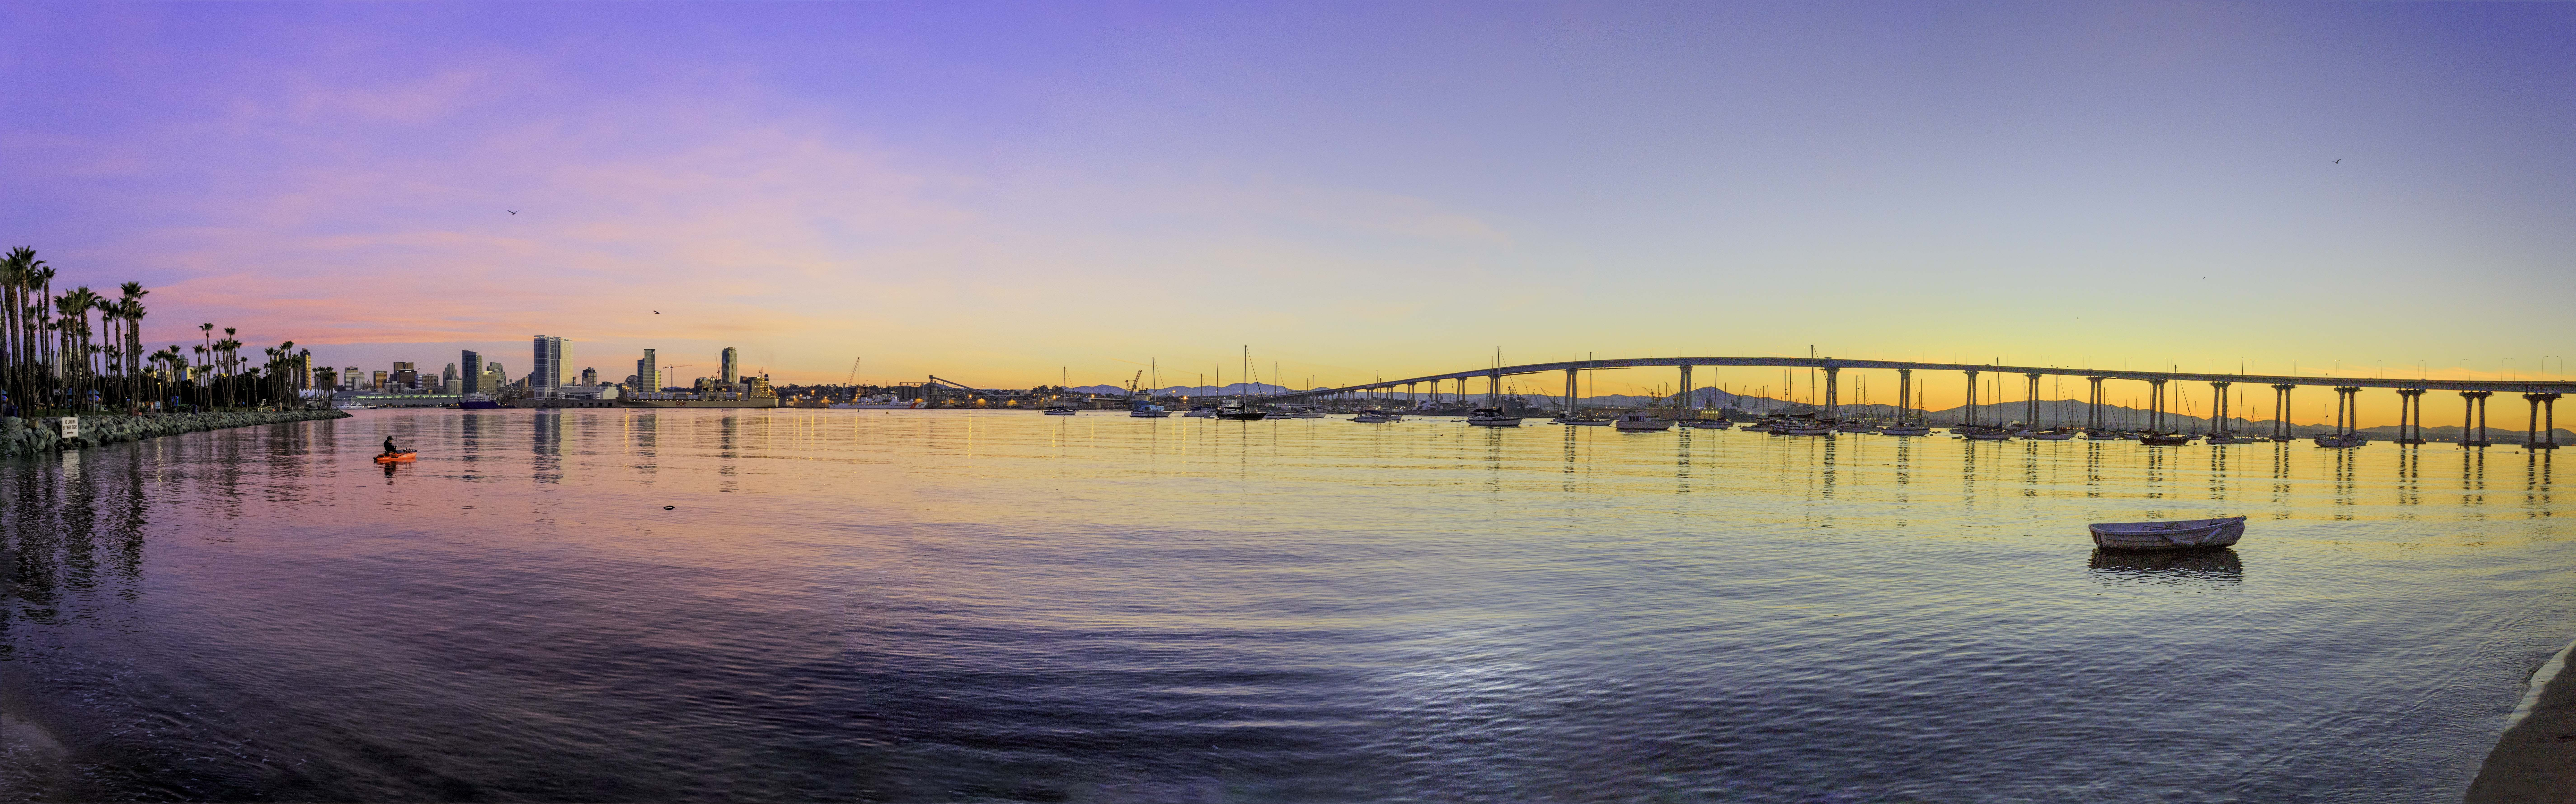 San_Diego_20180130-1859-Pano